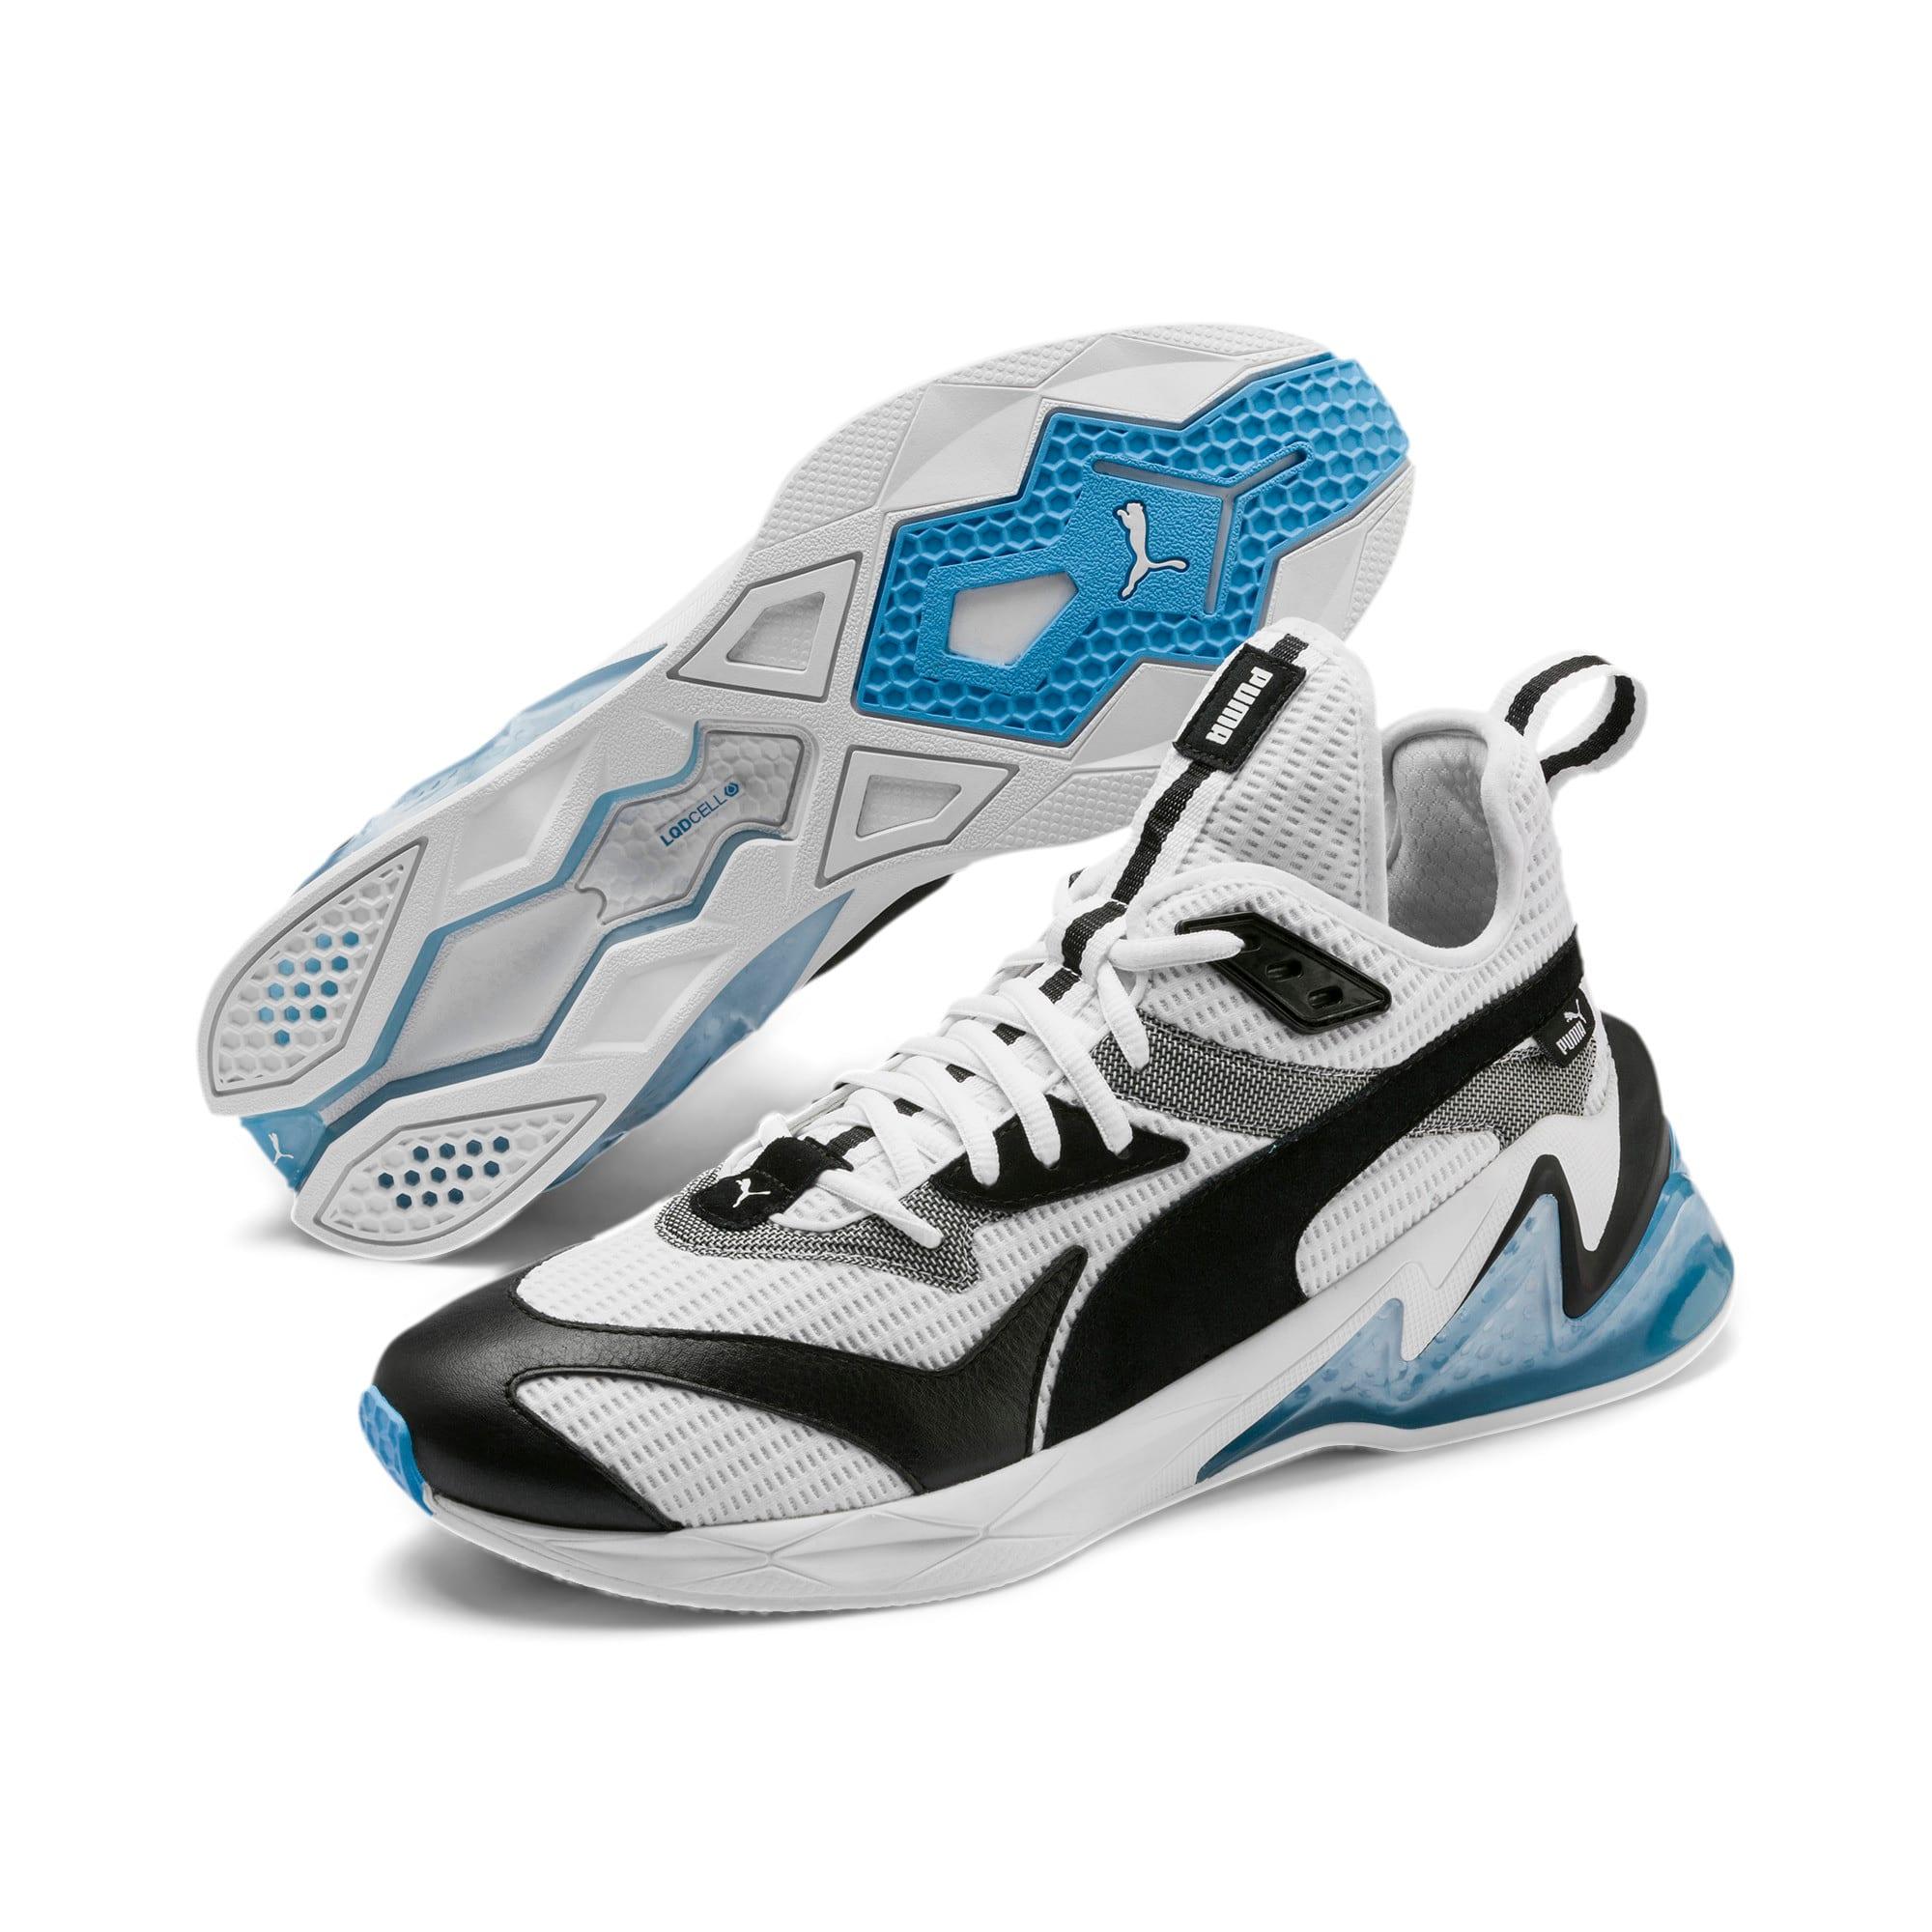 Thumbnail 3 of LQDCELL Origin Men's Training Shoes, Puma White-Puma Black, medium